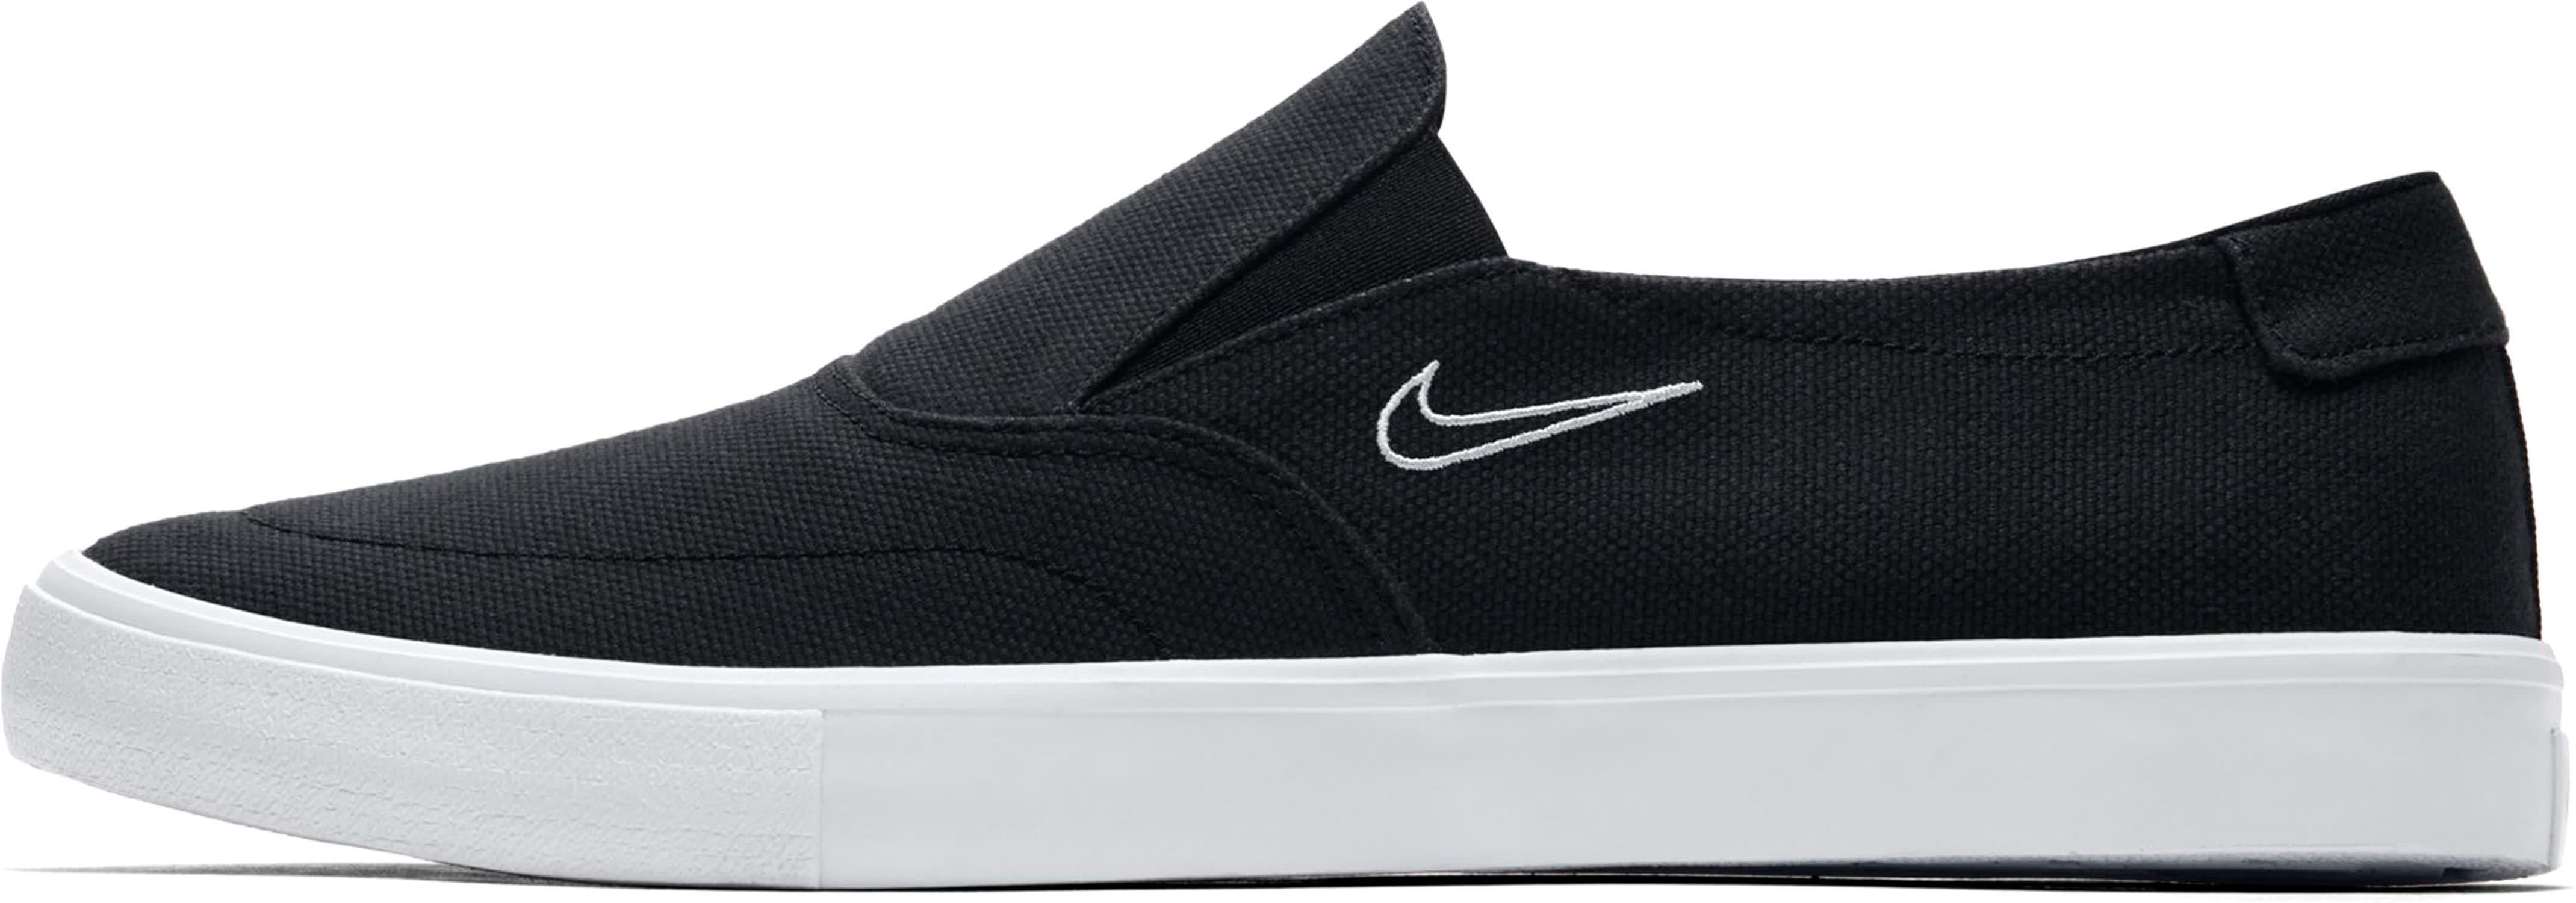 382665402dd7 Nike SB Portmore II Solarsoft Slip Skate Shoes - thumbnail 1